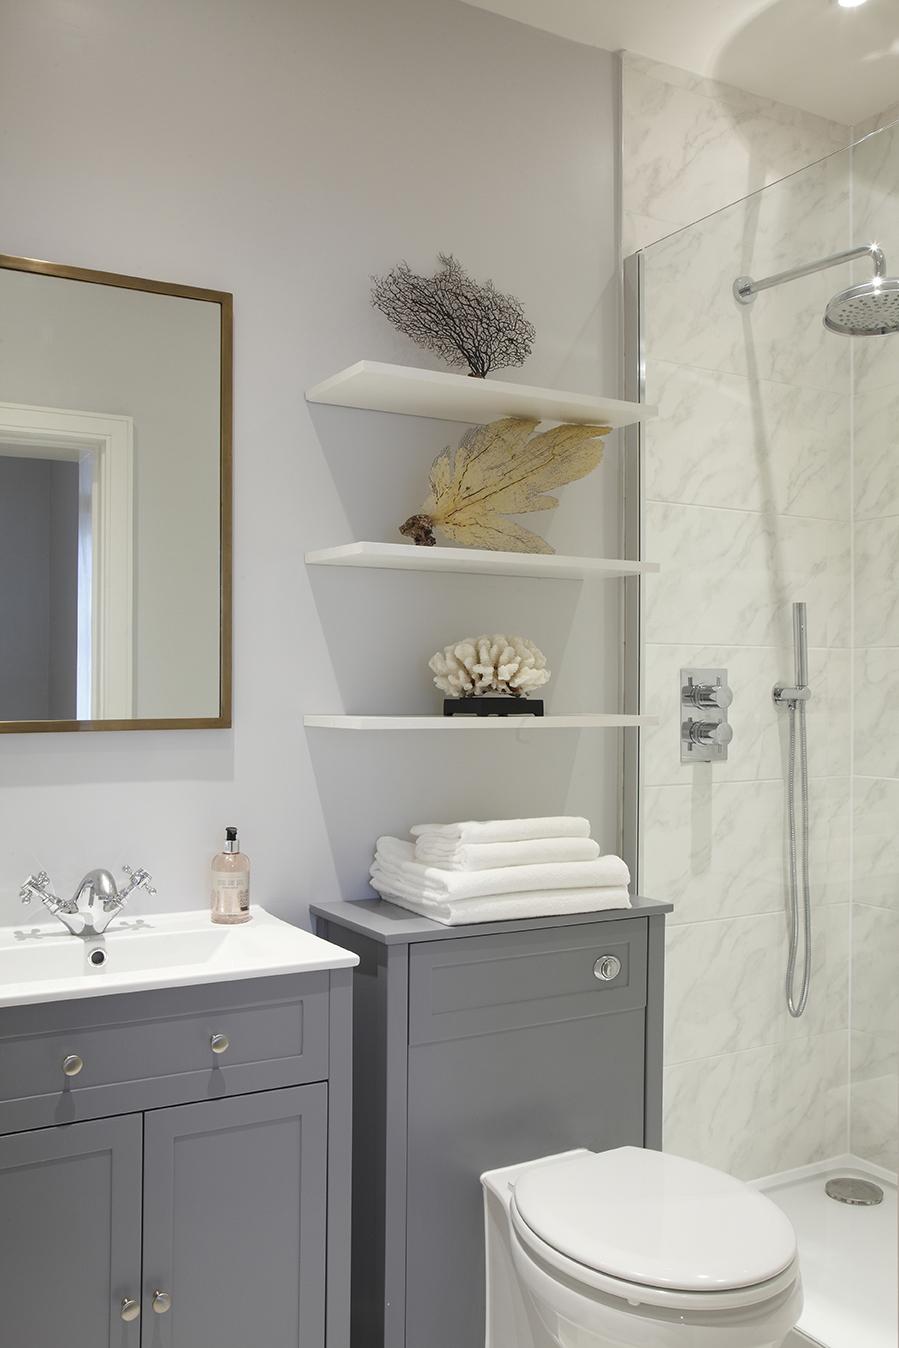 NW1 - Guest bathroom .jpg